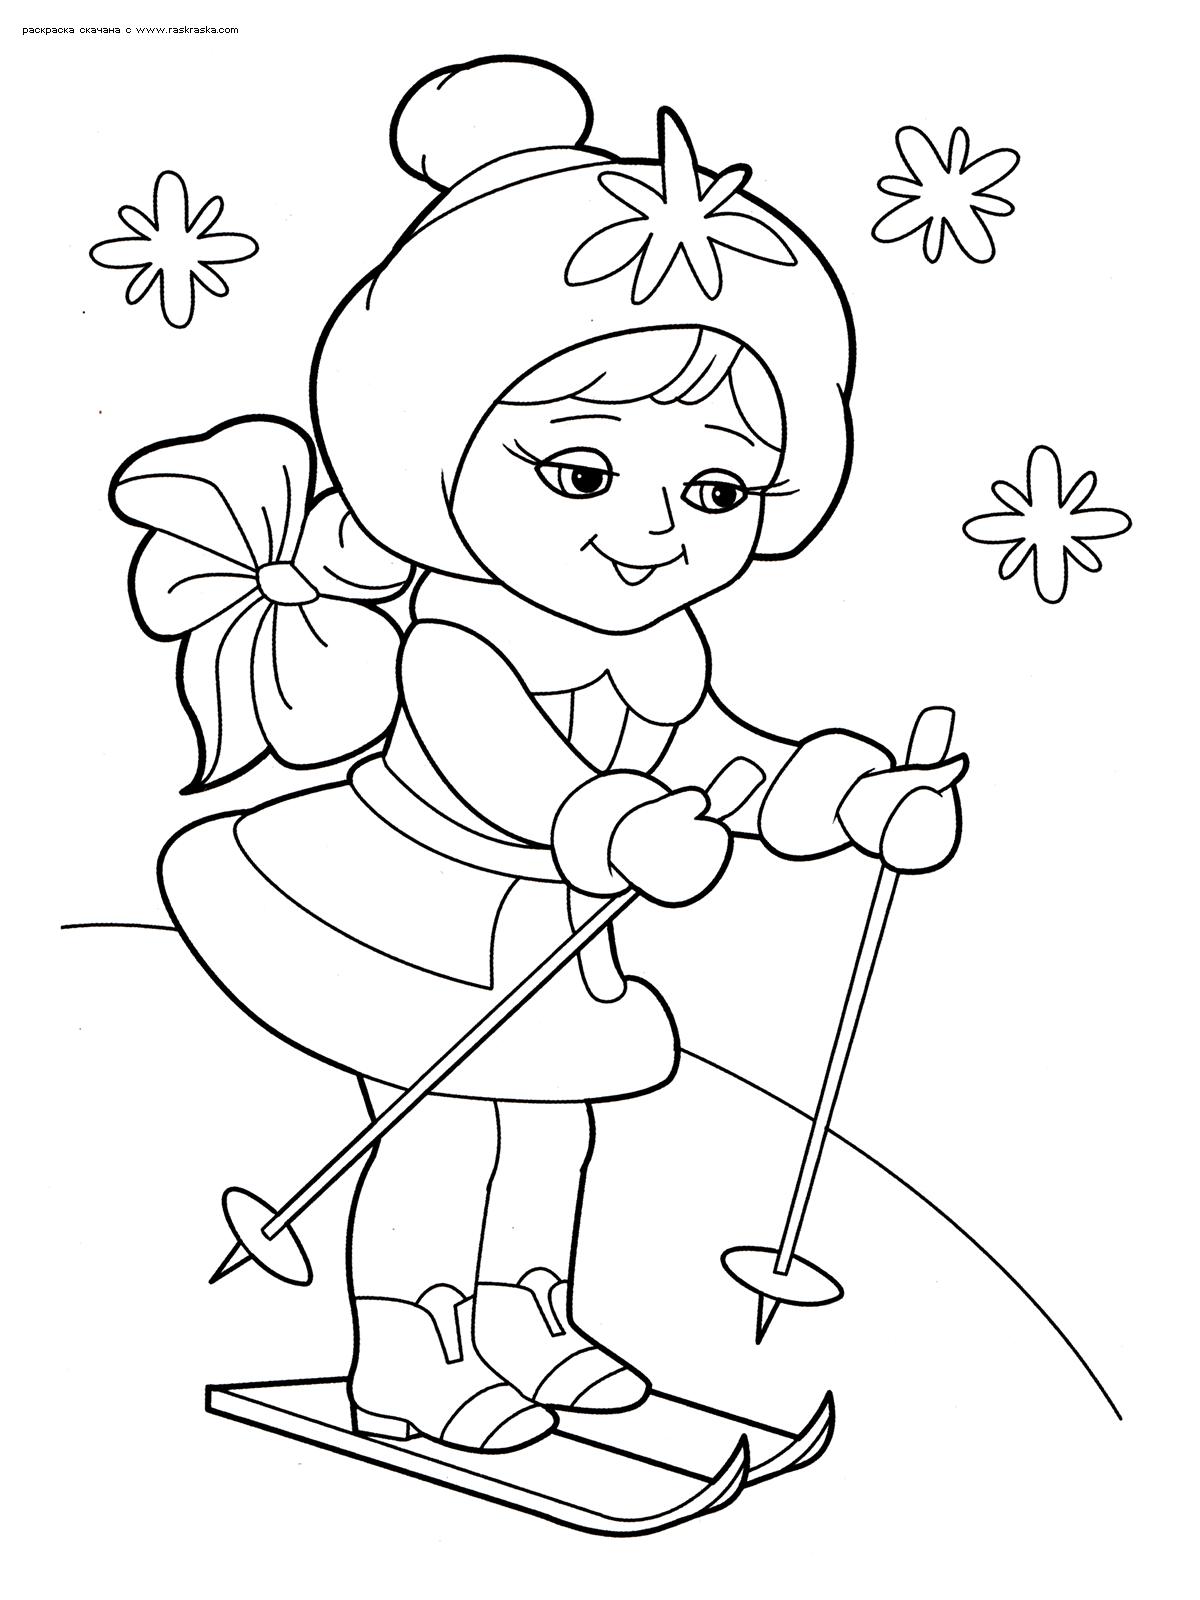 Раскраска Снегурочка на лыжах. Раскраска снегурочка